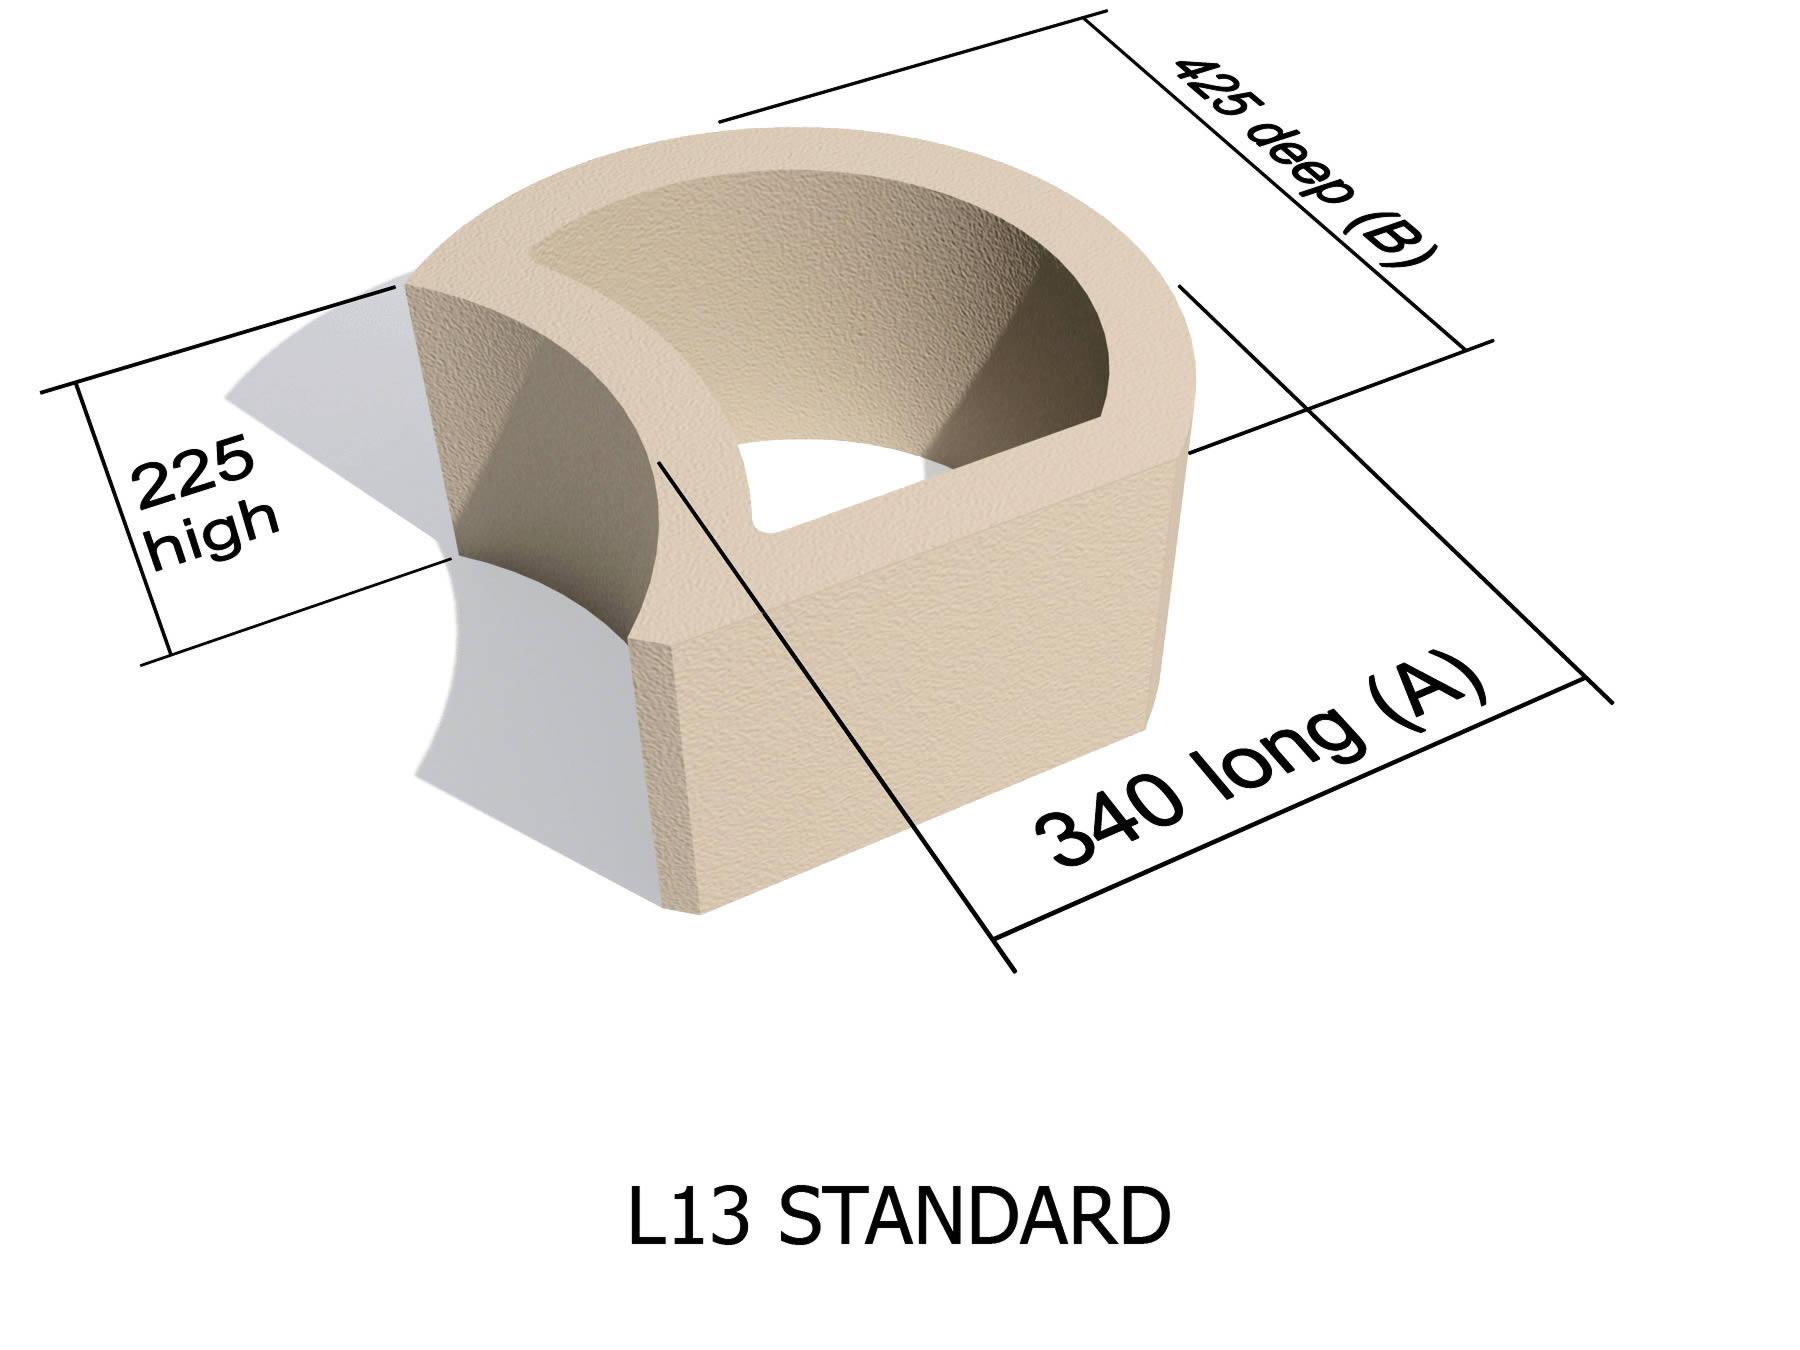 L13 block